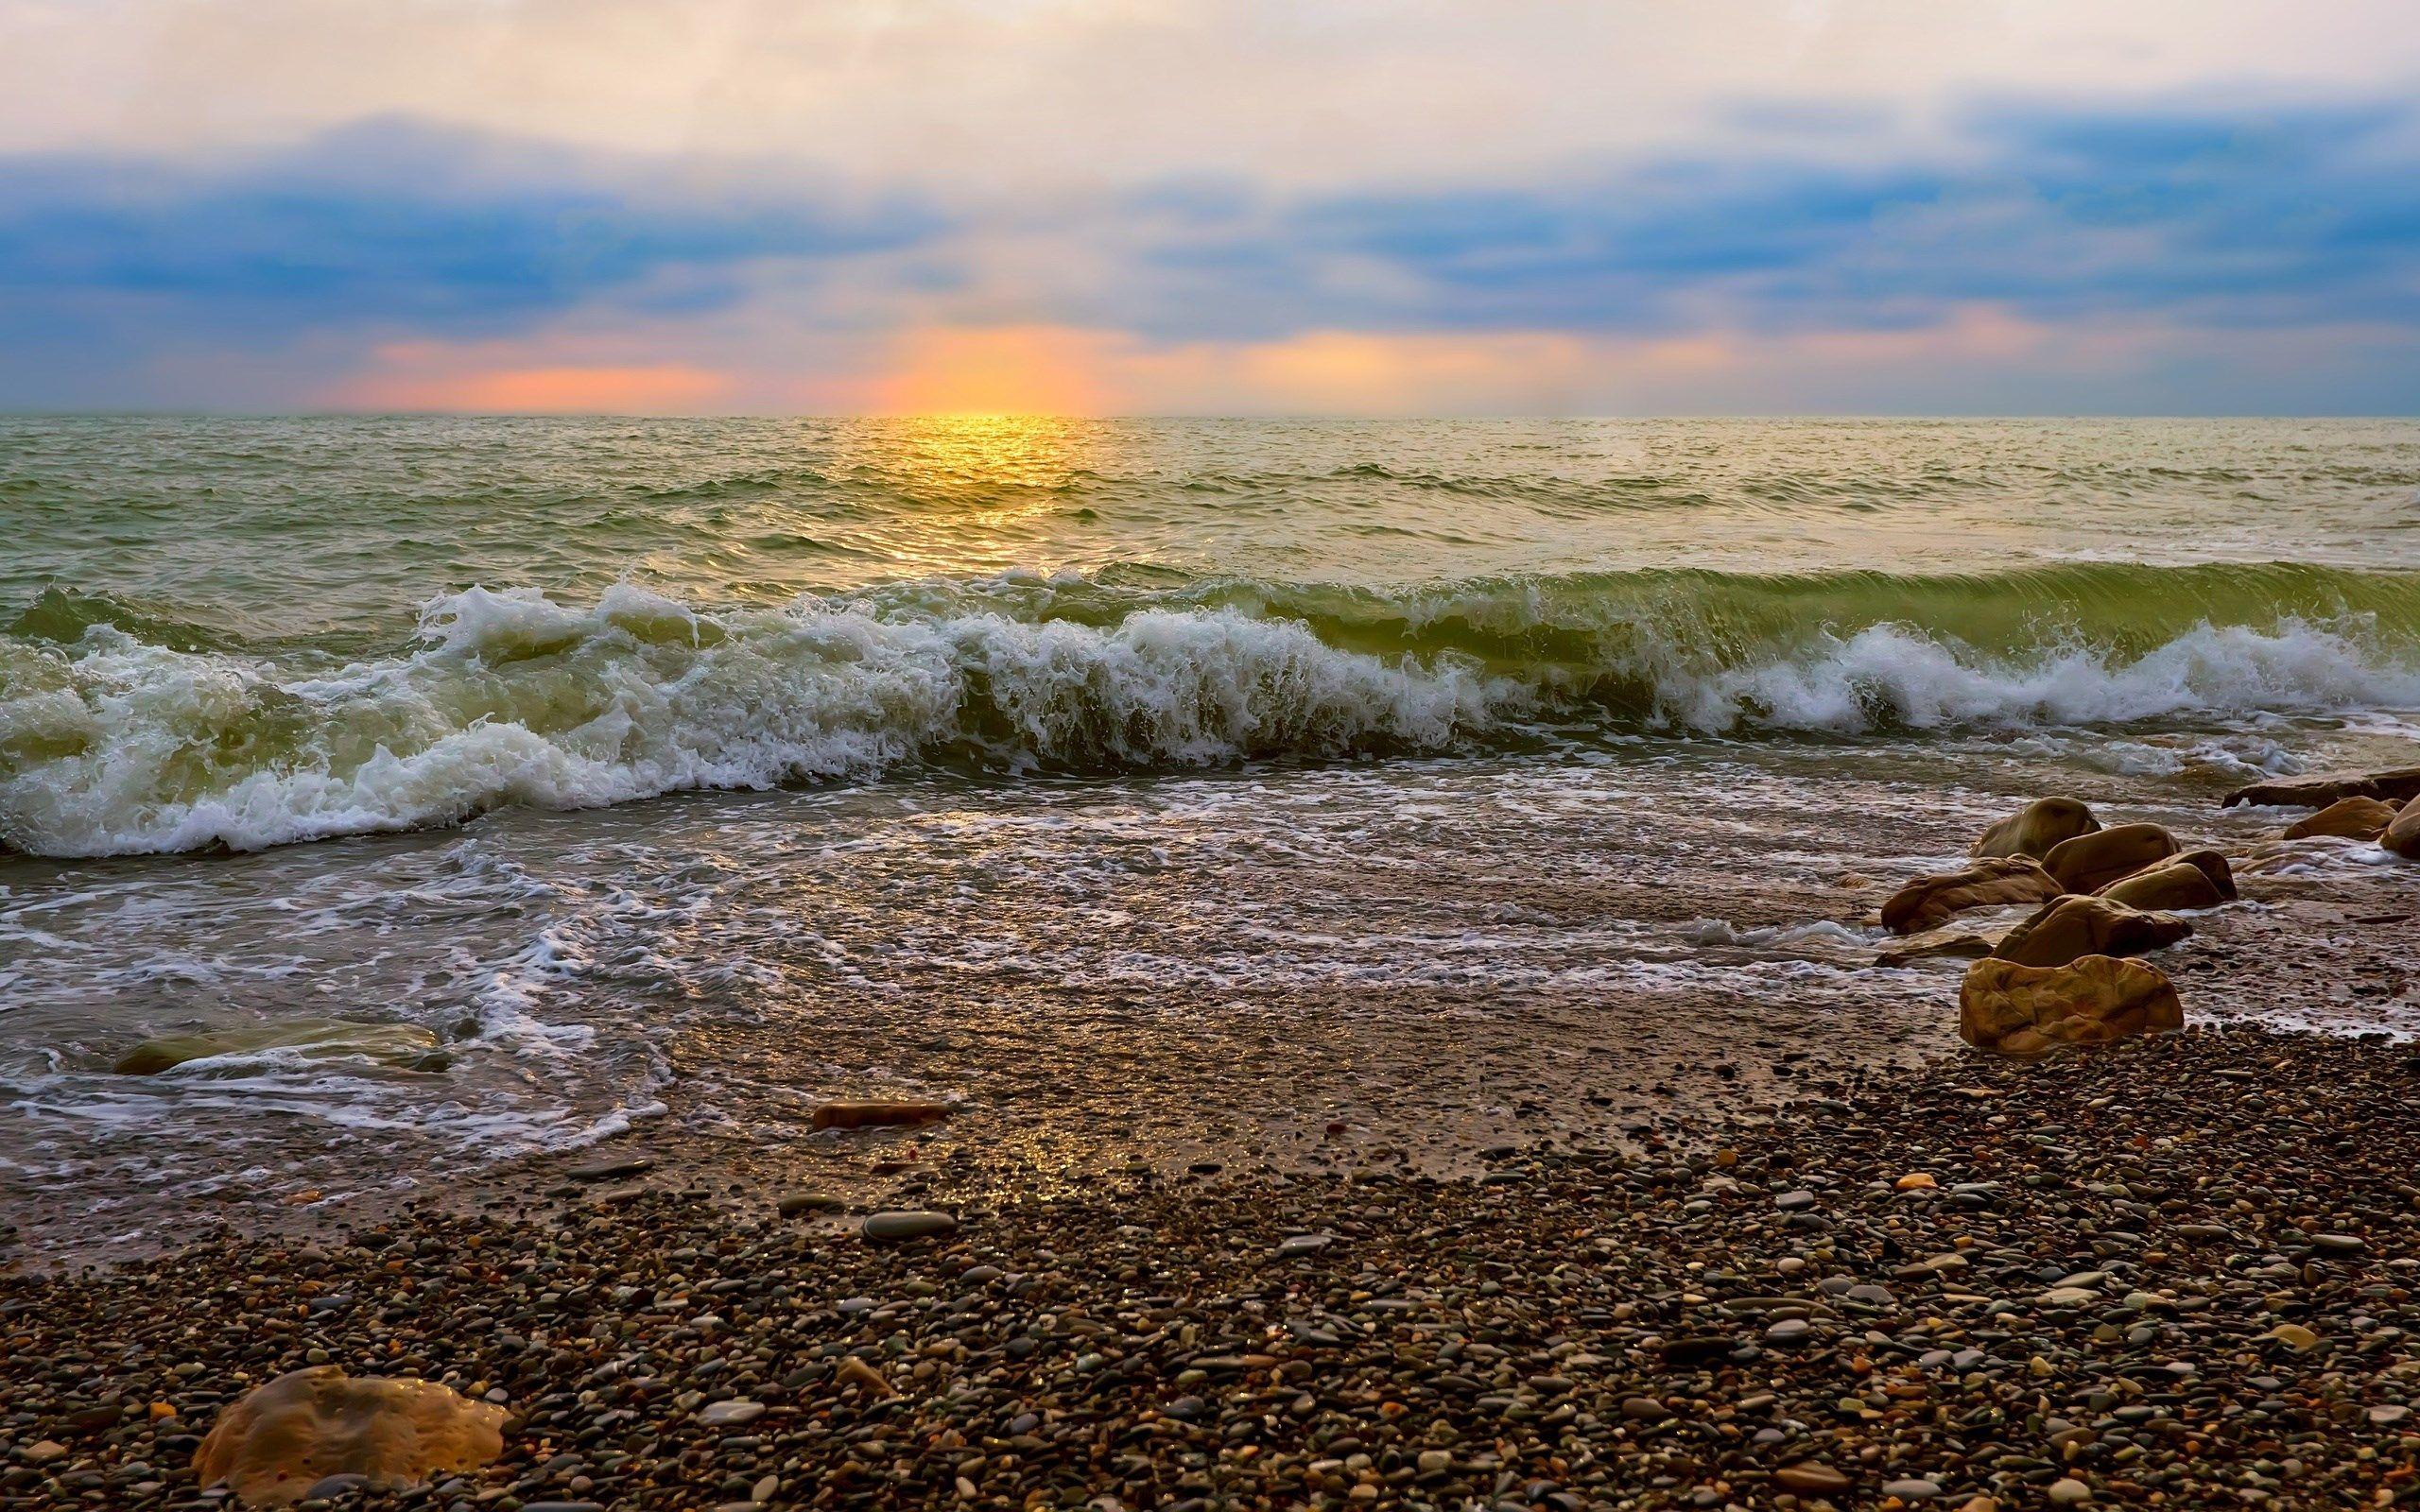 Beach Widescreen Retina Imac 2560x1600 Nature Nature Hd Nature Wallpaper